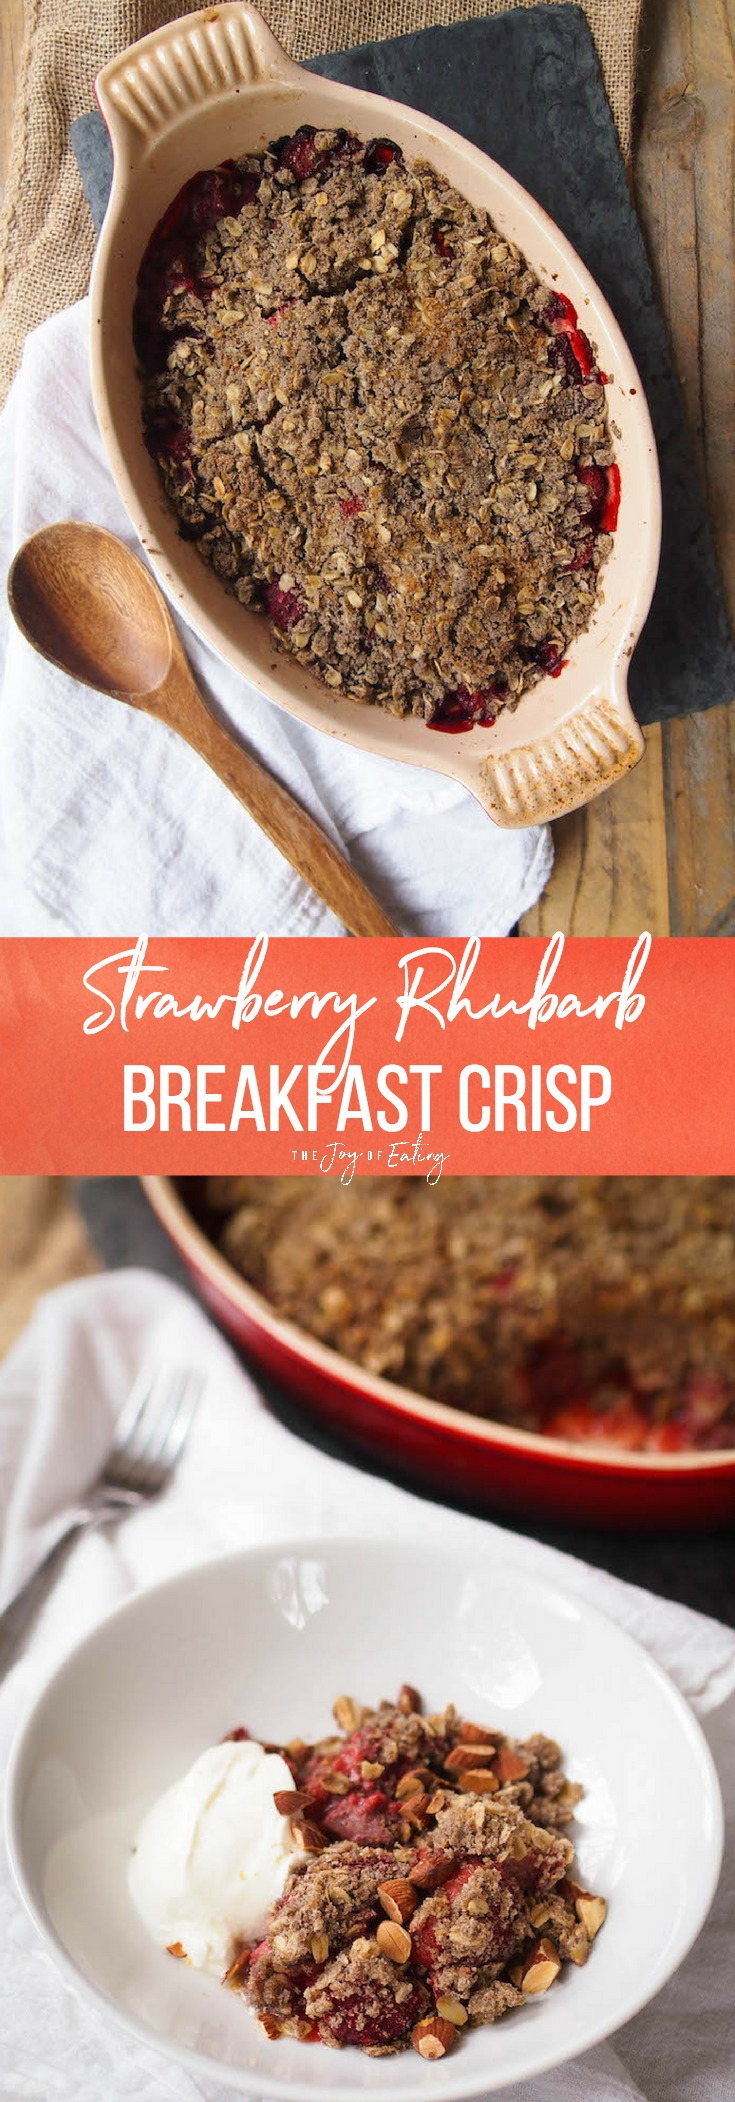 Strawberry Rhubarb Breakfast Crisp